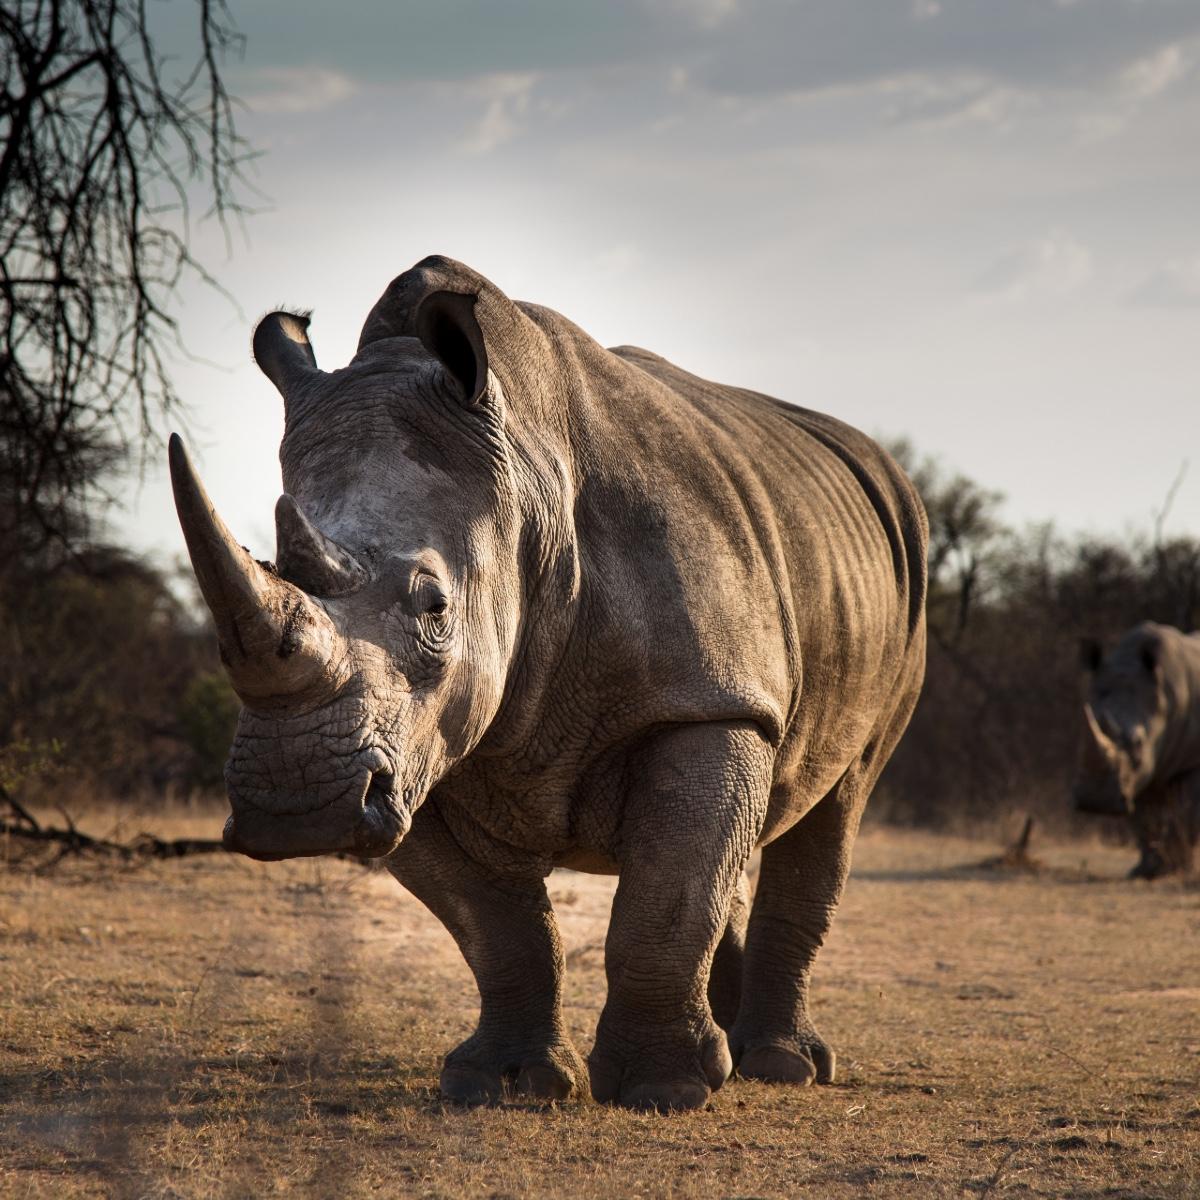 Rhino - Cape Town Safari